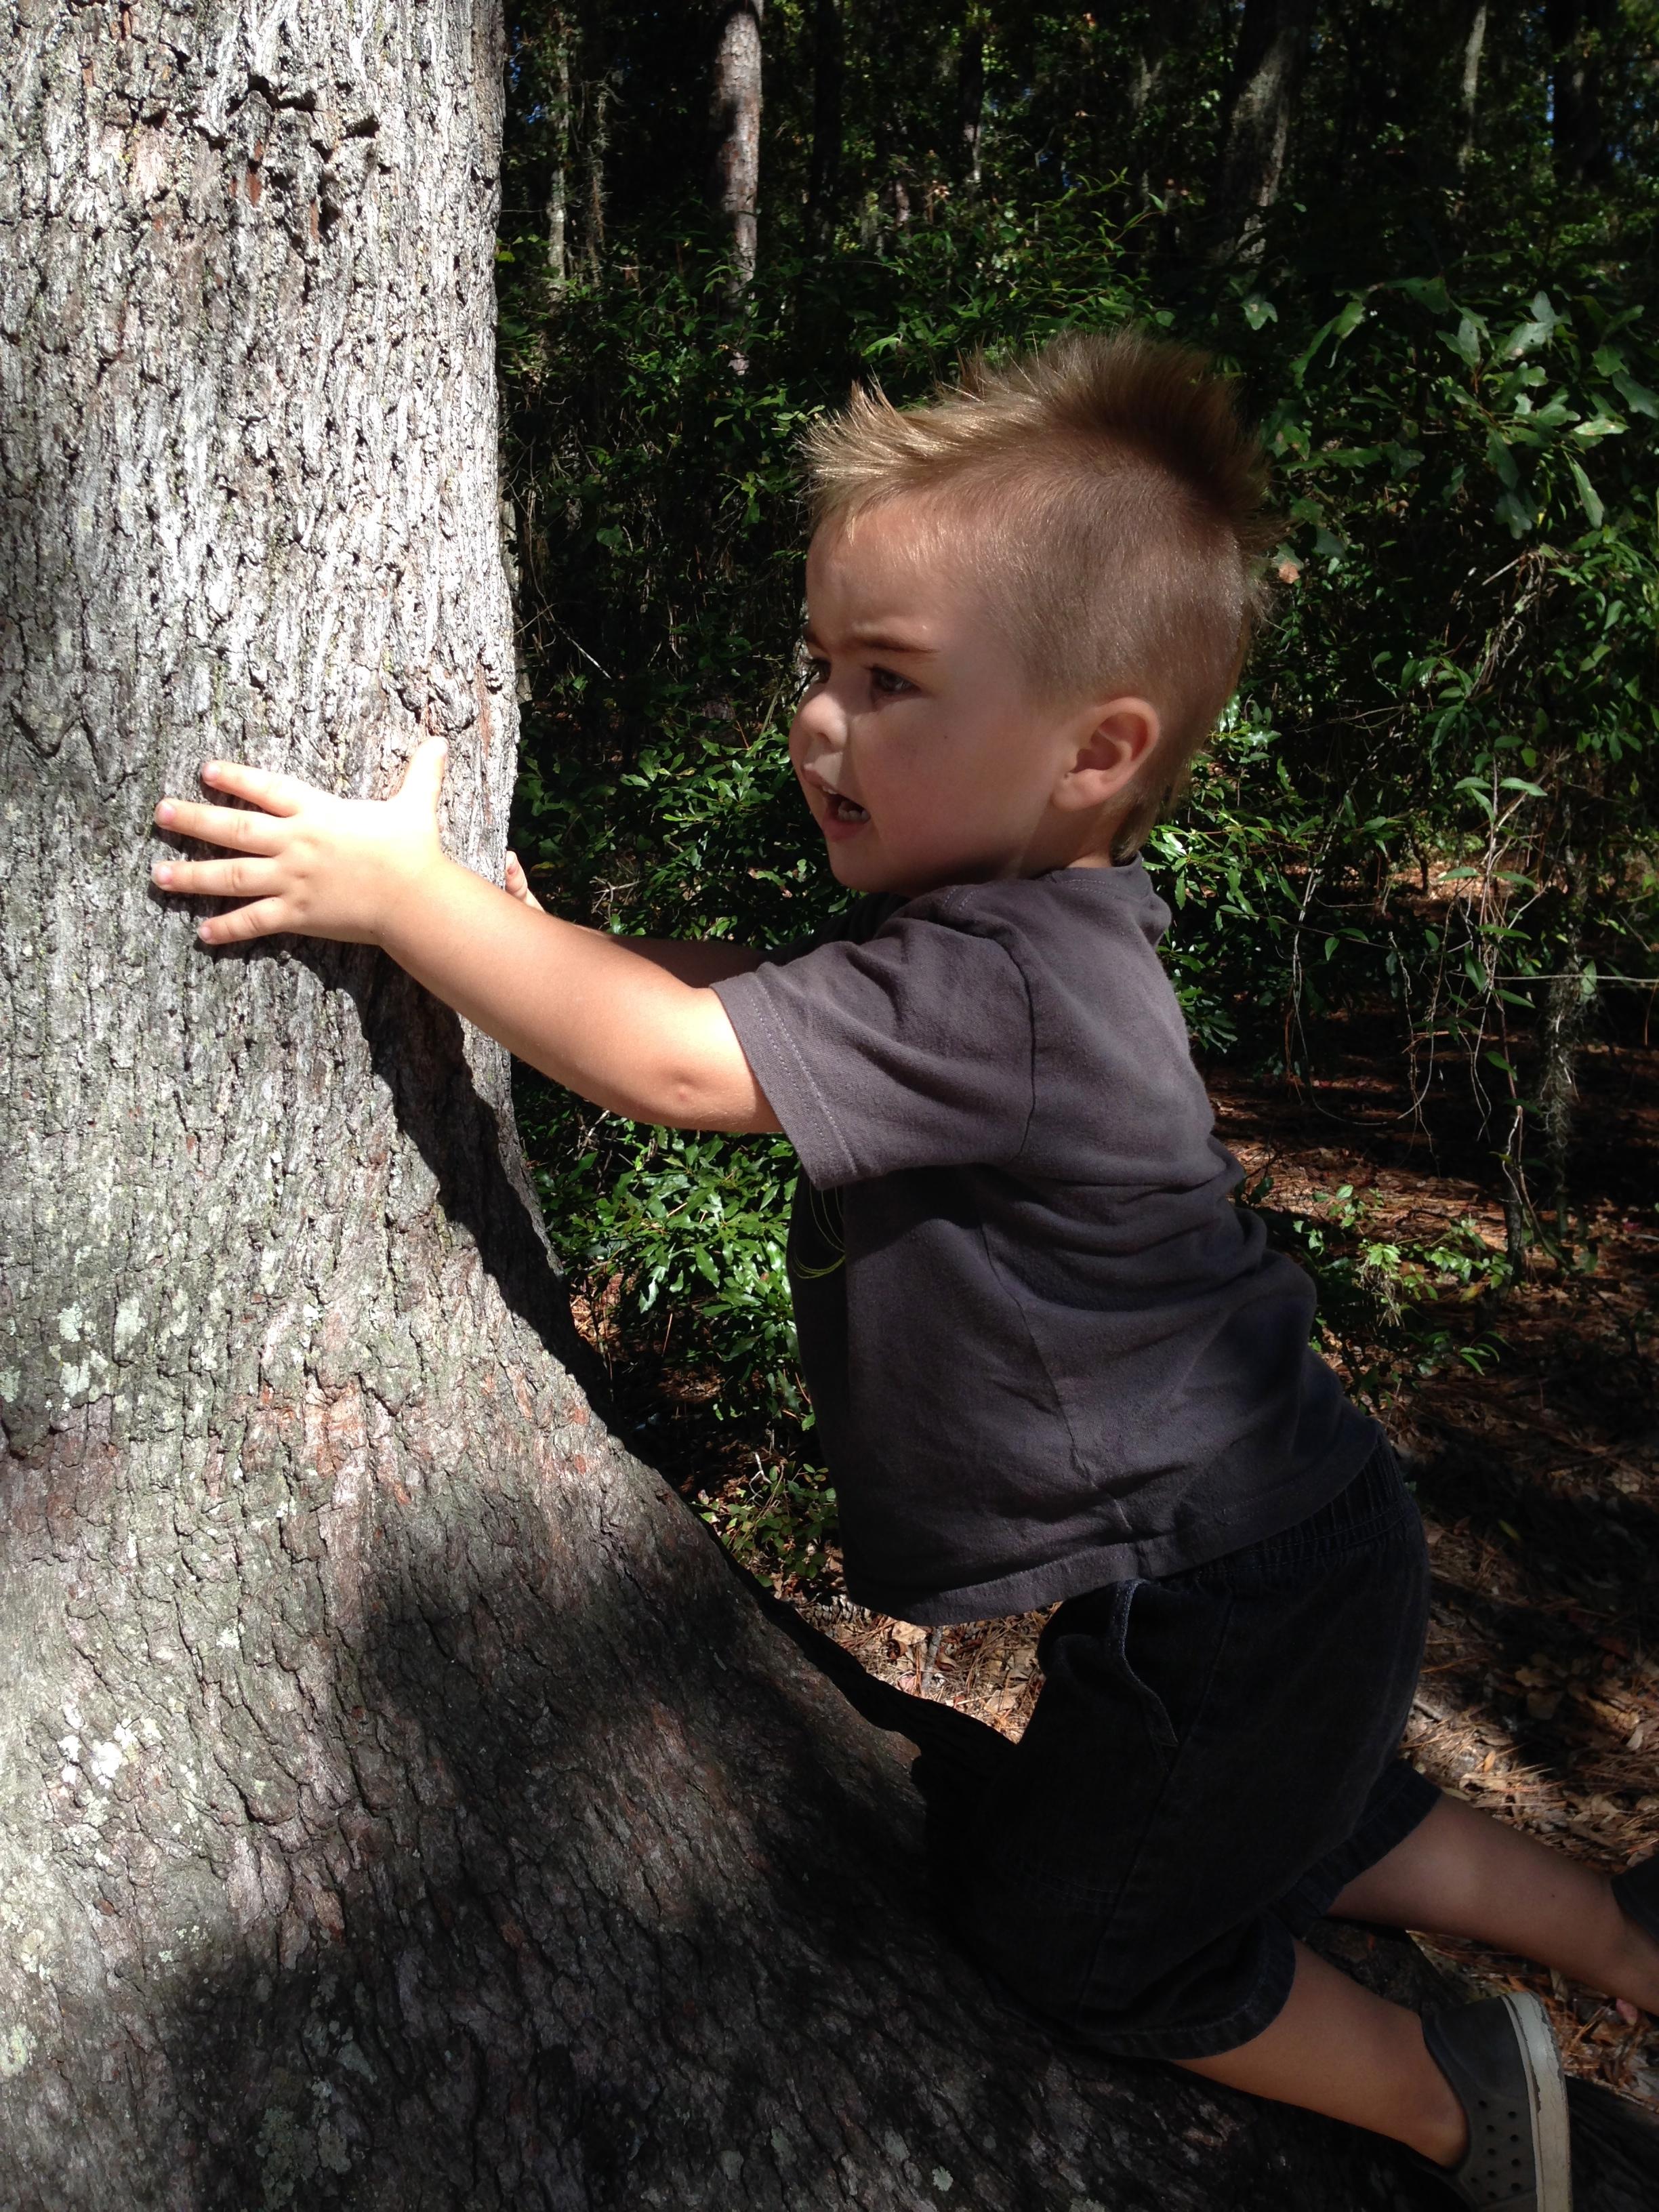 MJ2 Climbing a Tree